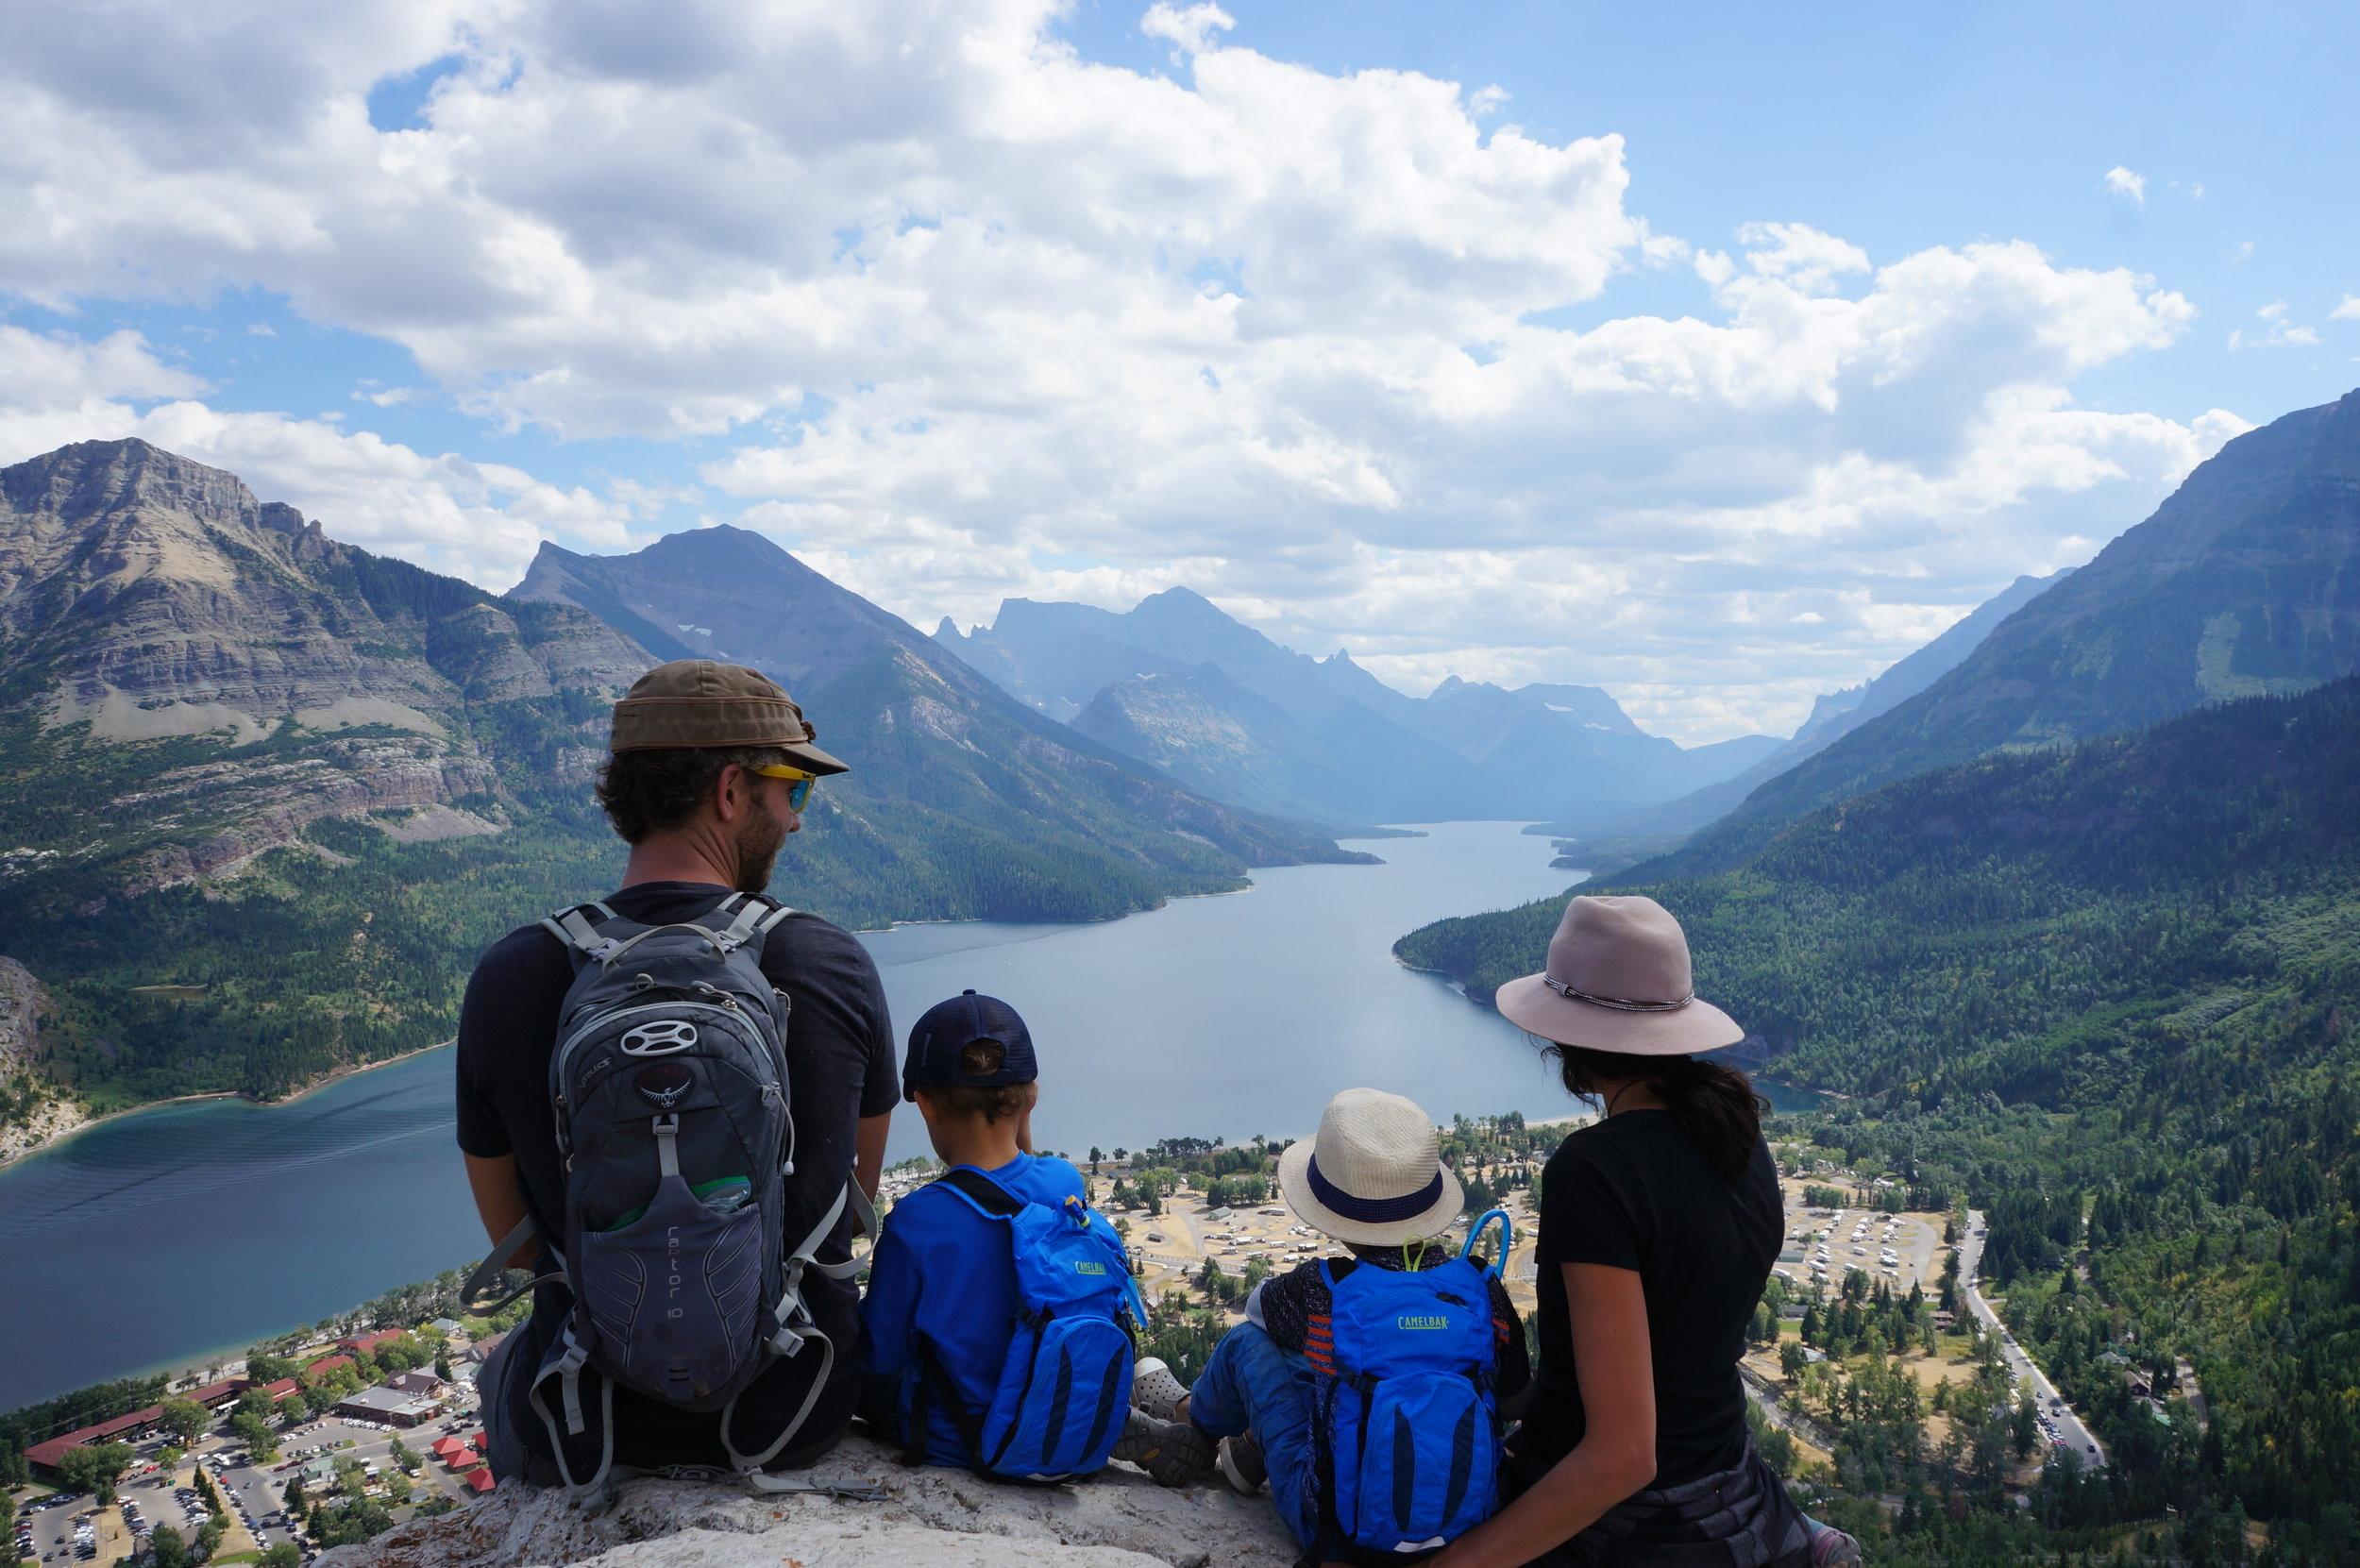 Bears Hump, Waterton Lakes Canada - Short and steep with views so sweet!